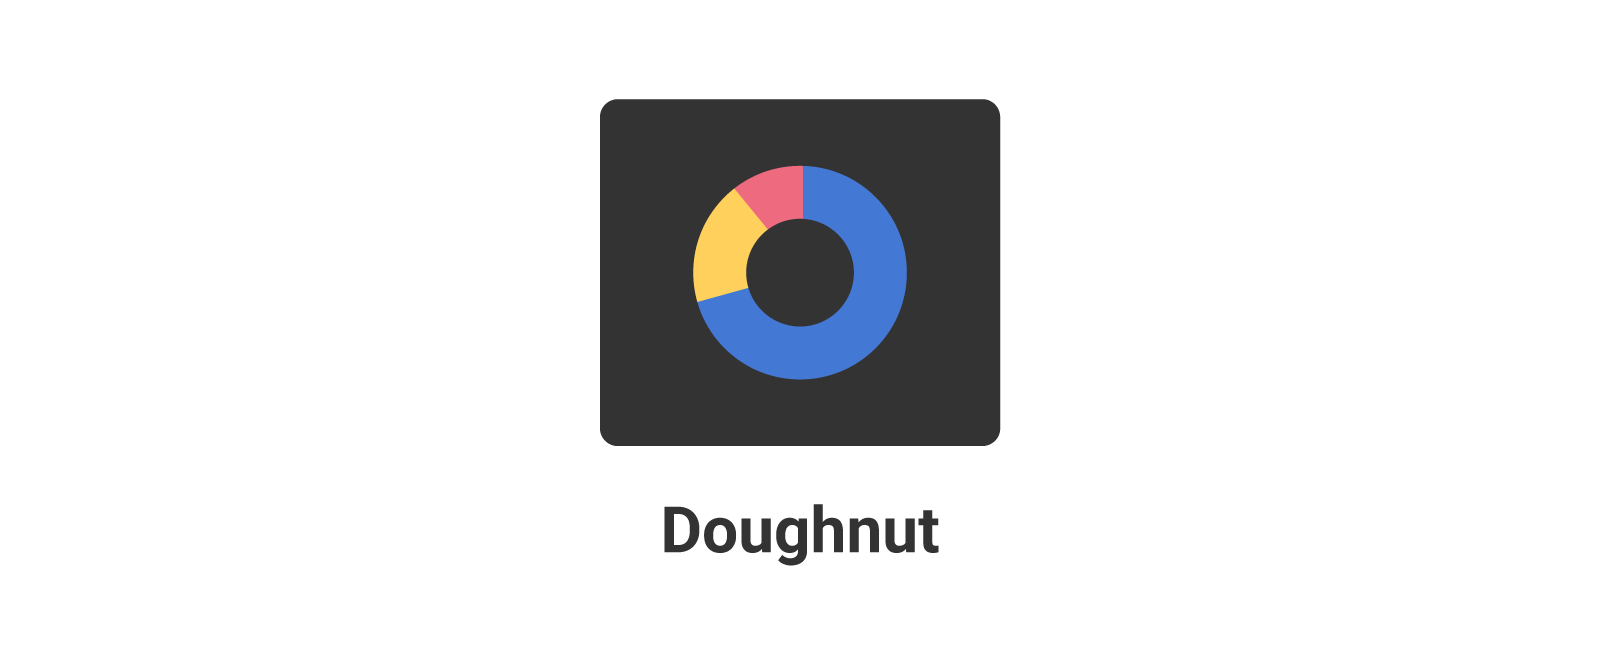 donut chart example